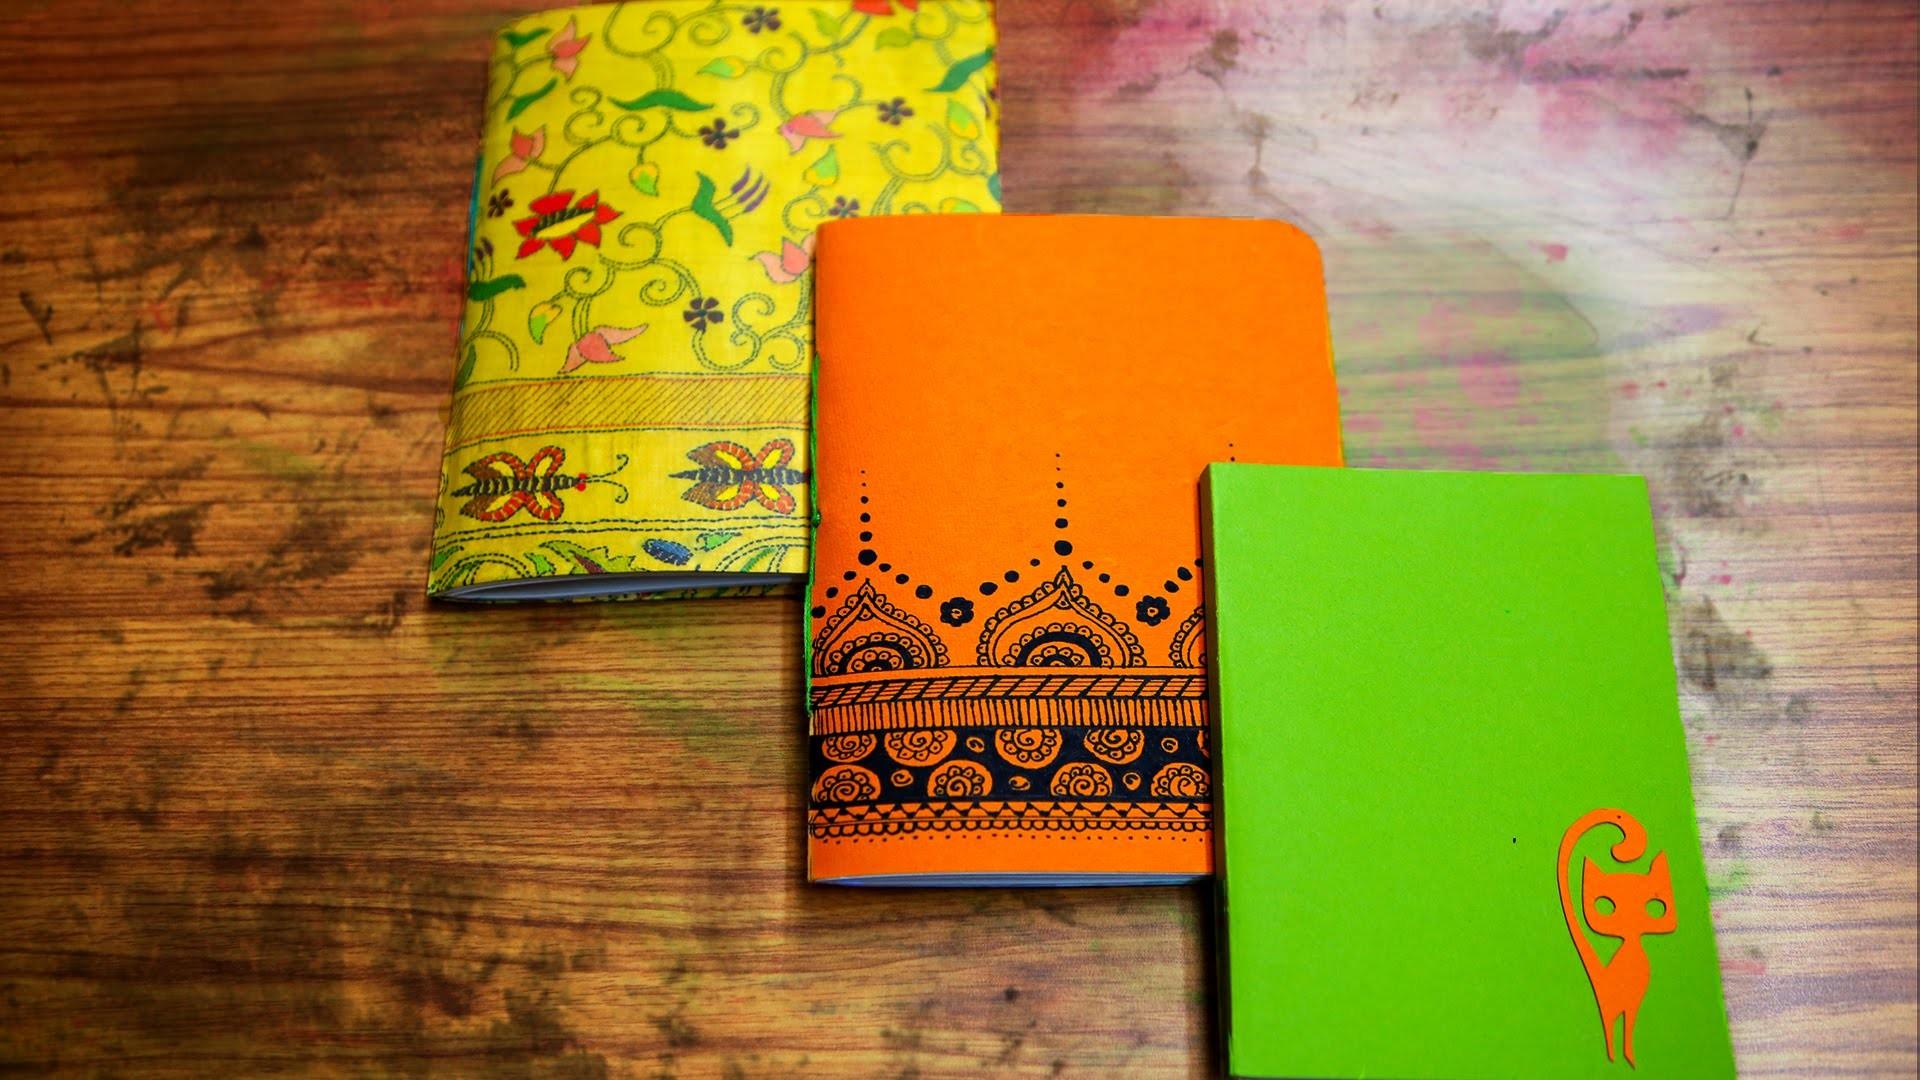 How To Make A Handmade Book | DIY Paper Crafts